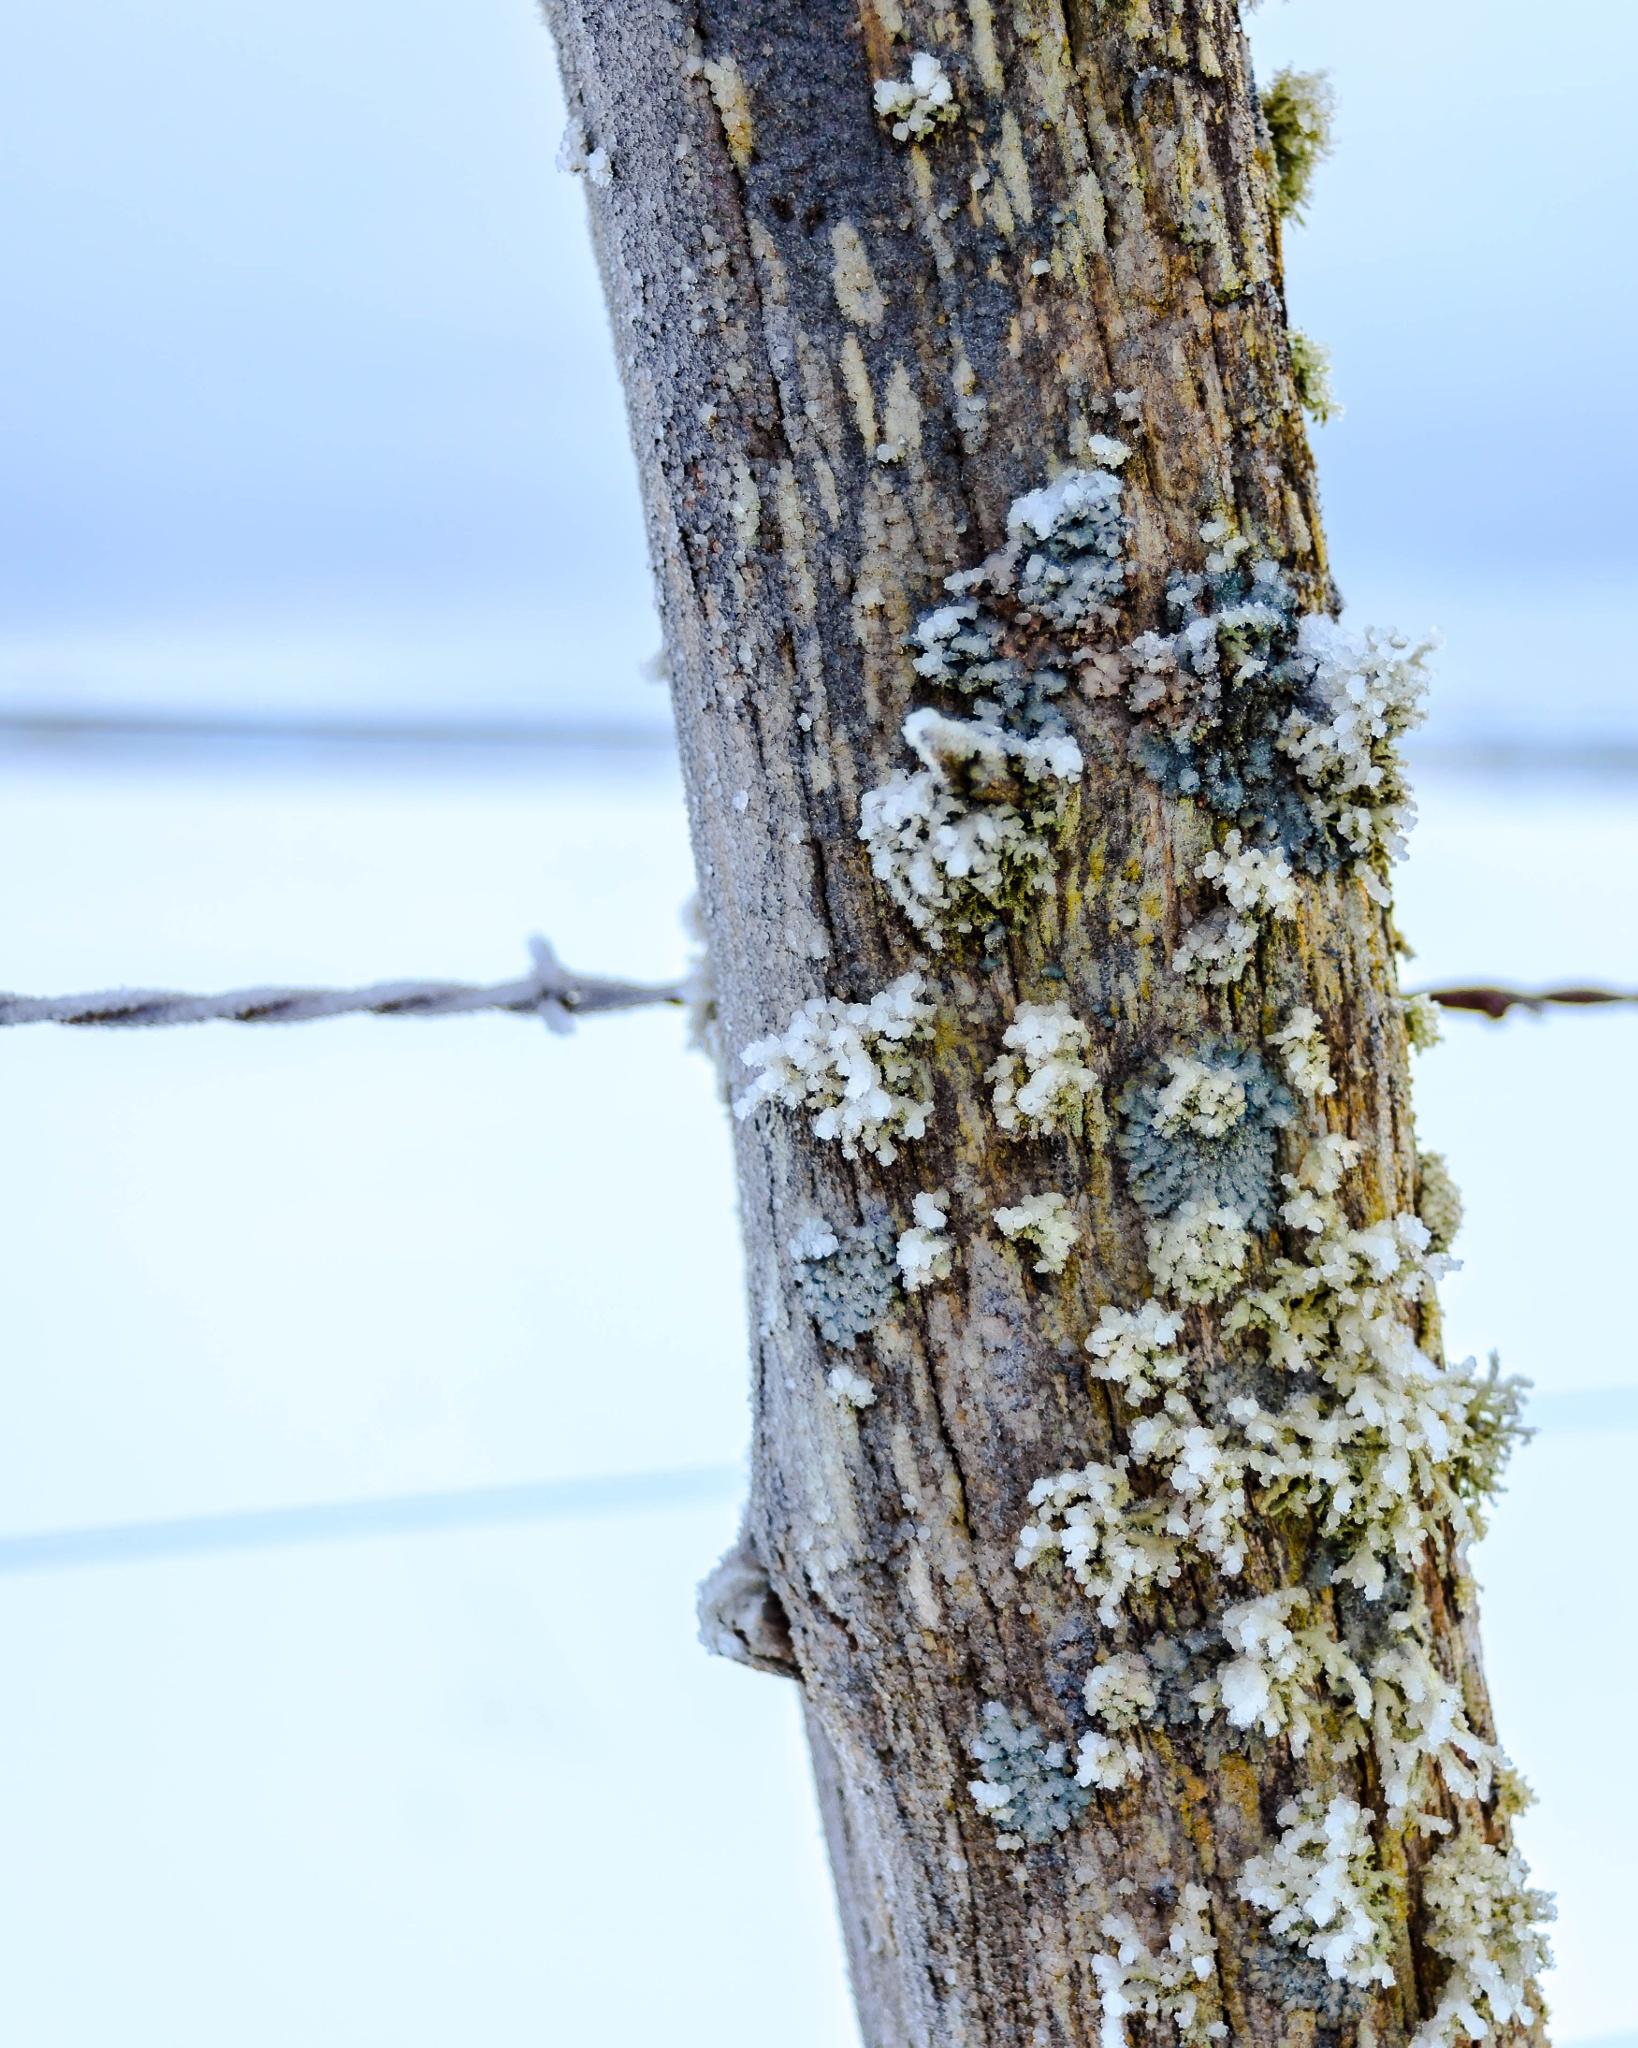 Ice on the fence by Luke Johnson